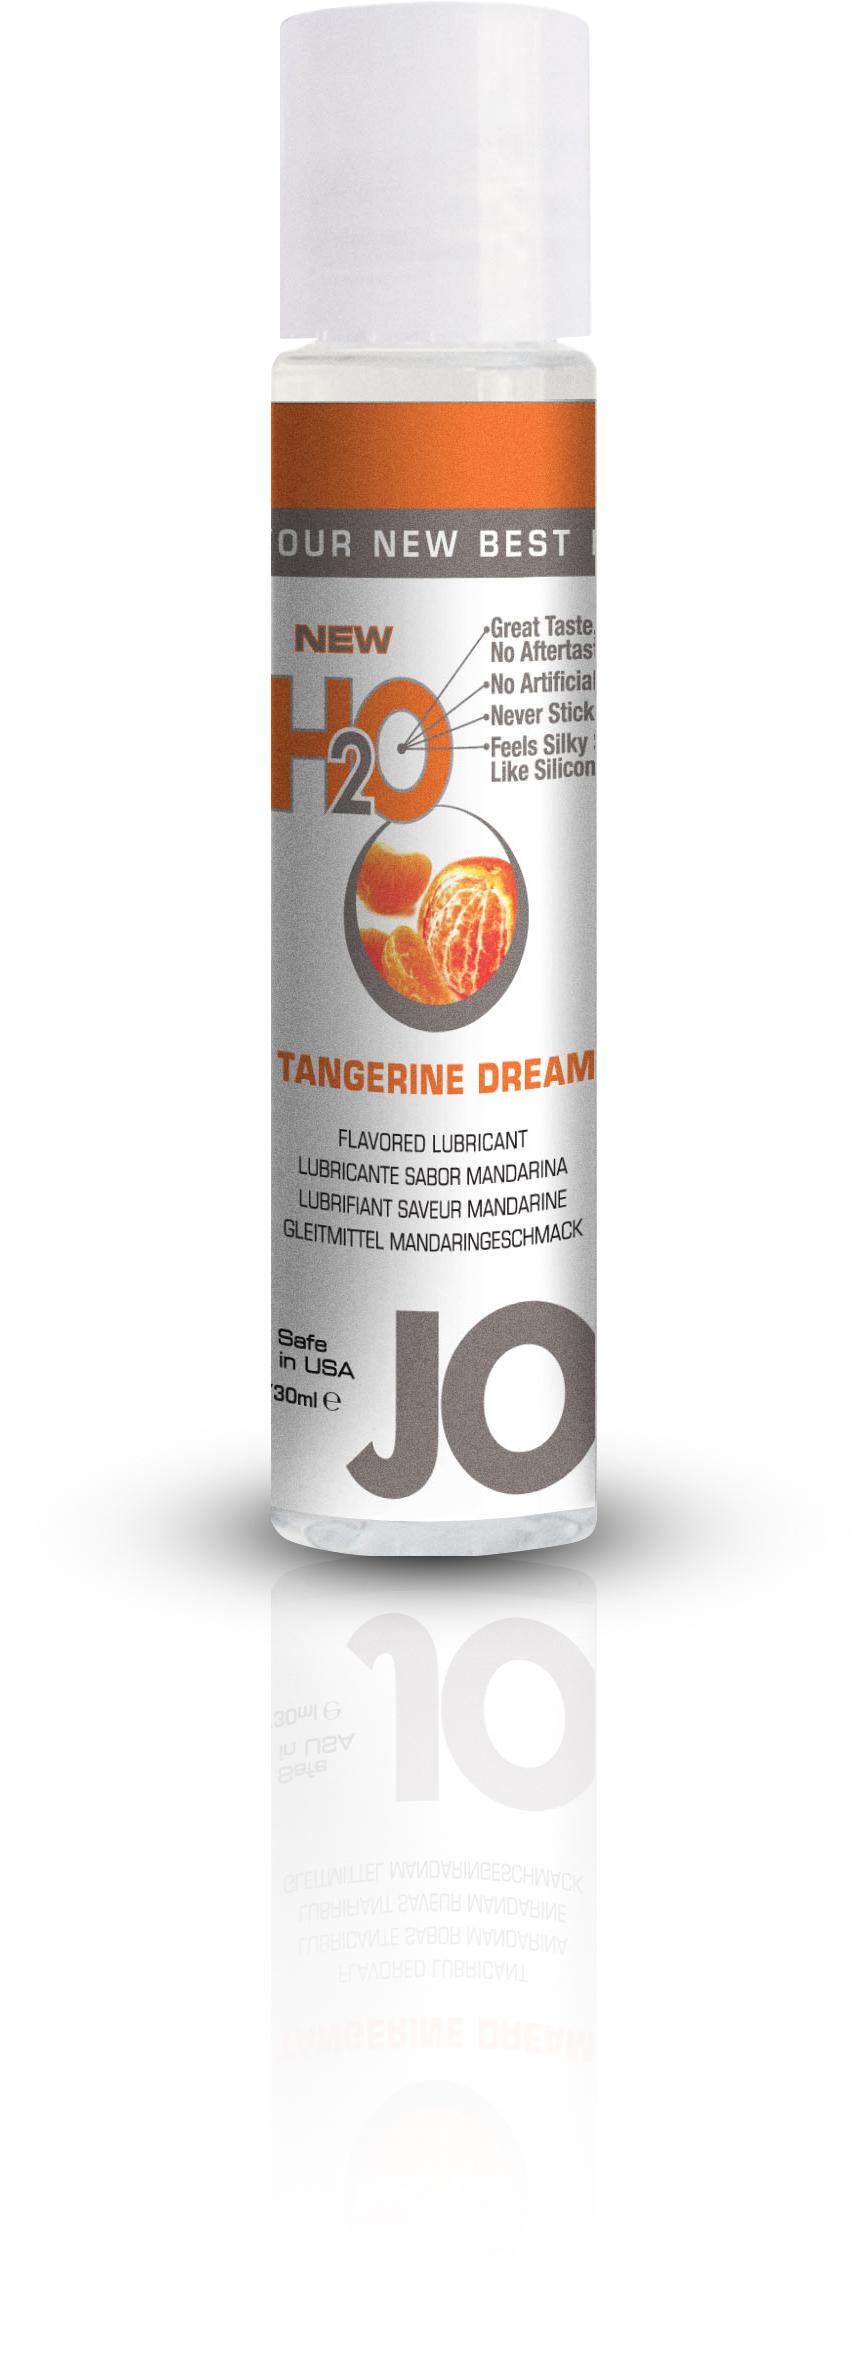 30129_JO_h2o_flavored_lubricant_1oz_1oz_tangerine.jpg